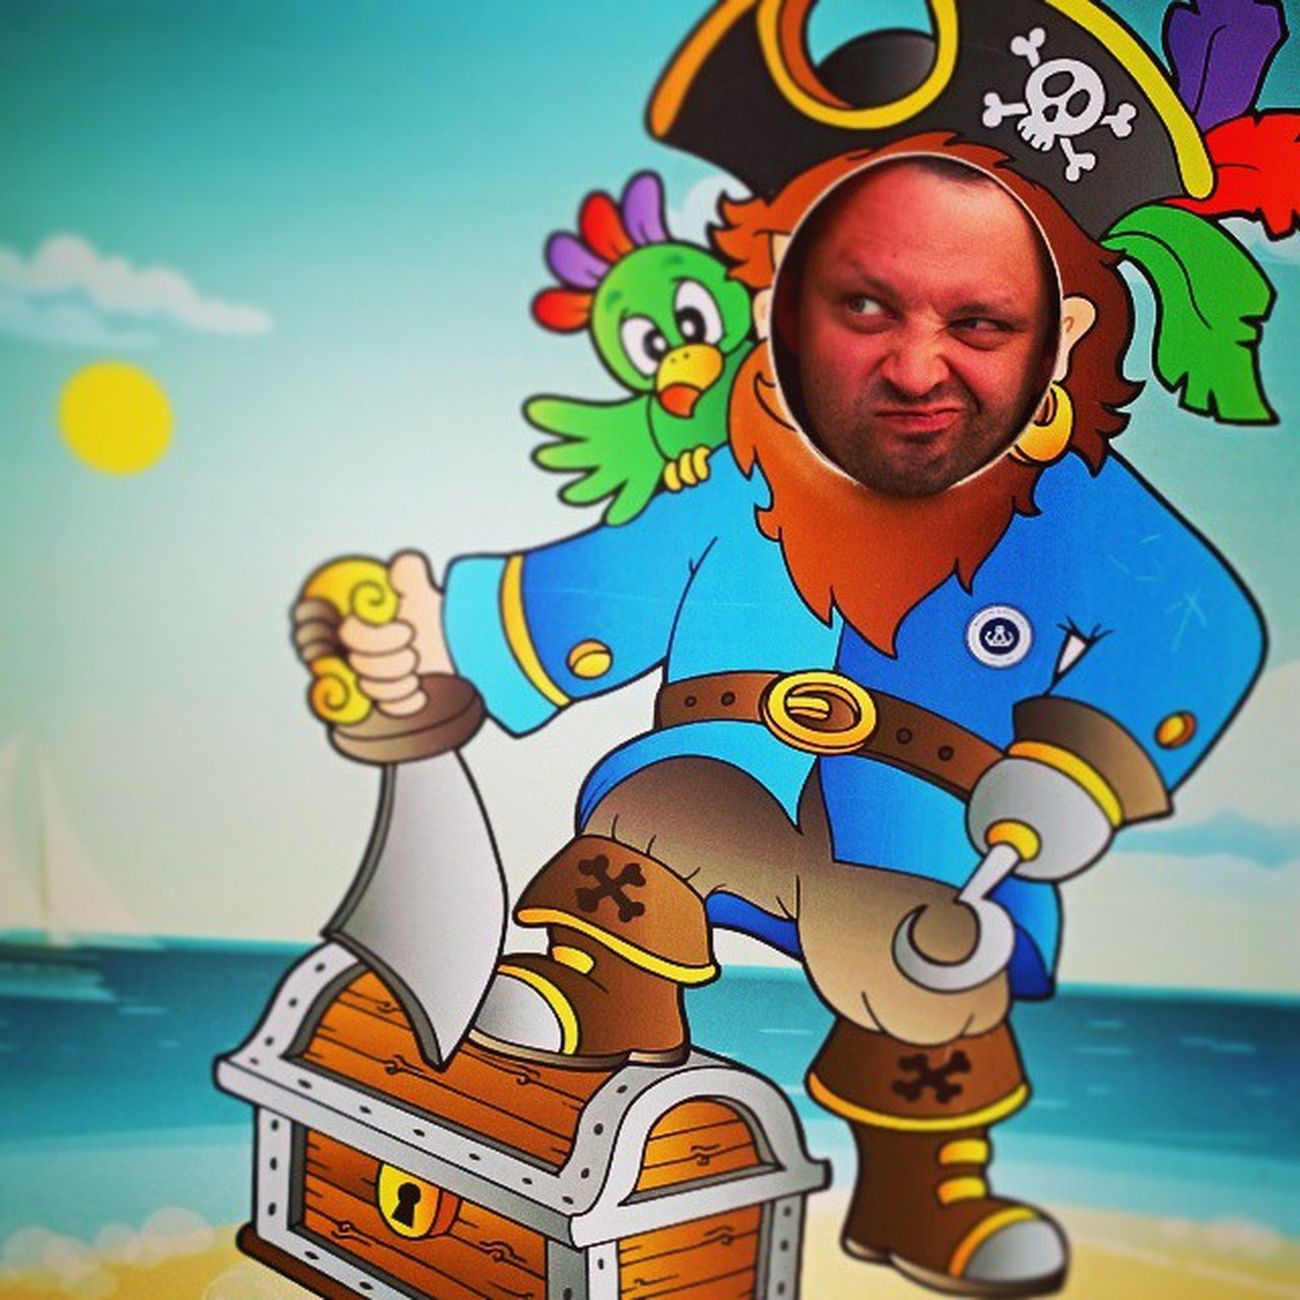 Captain on board! Pirate Captain Cartoon Fun Latergram Past_time Past_memories Balaton Balatonfüred Instagram Instafun Instamood Ig Ighun Osztalykirandulas 8a Baksay